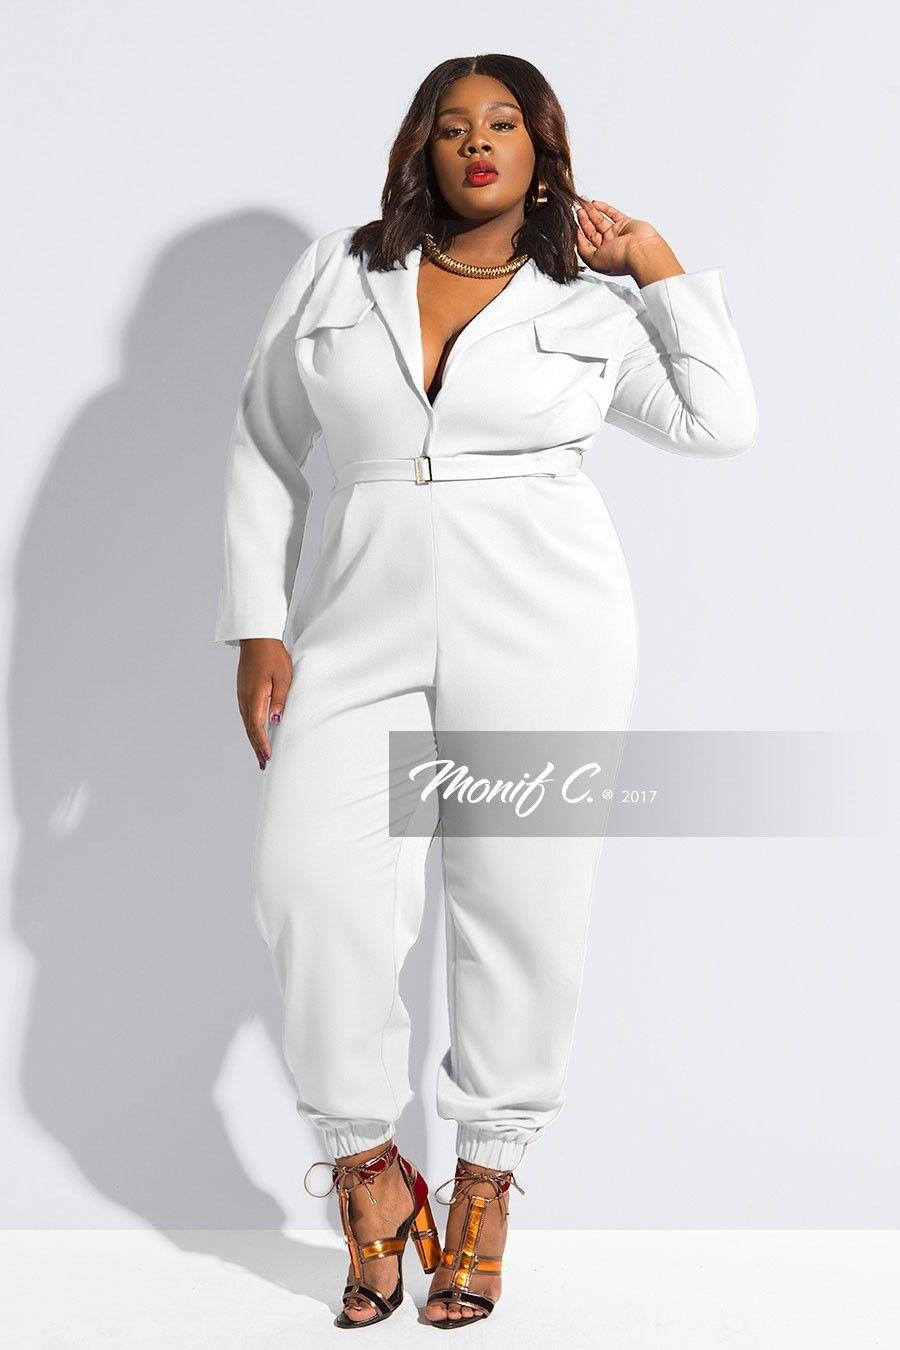 Samiyah Designer Plus Size Clothing Jumpsuits For Women Plus Size Fashion